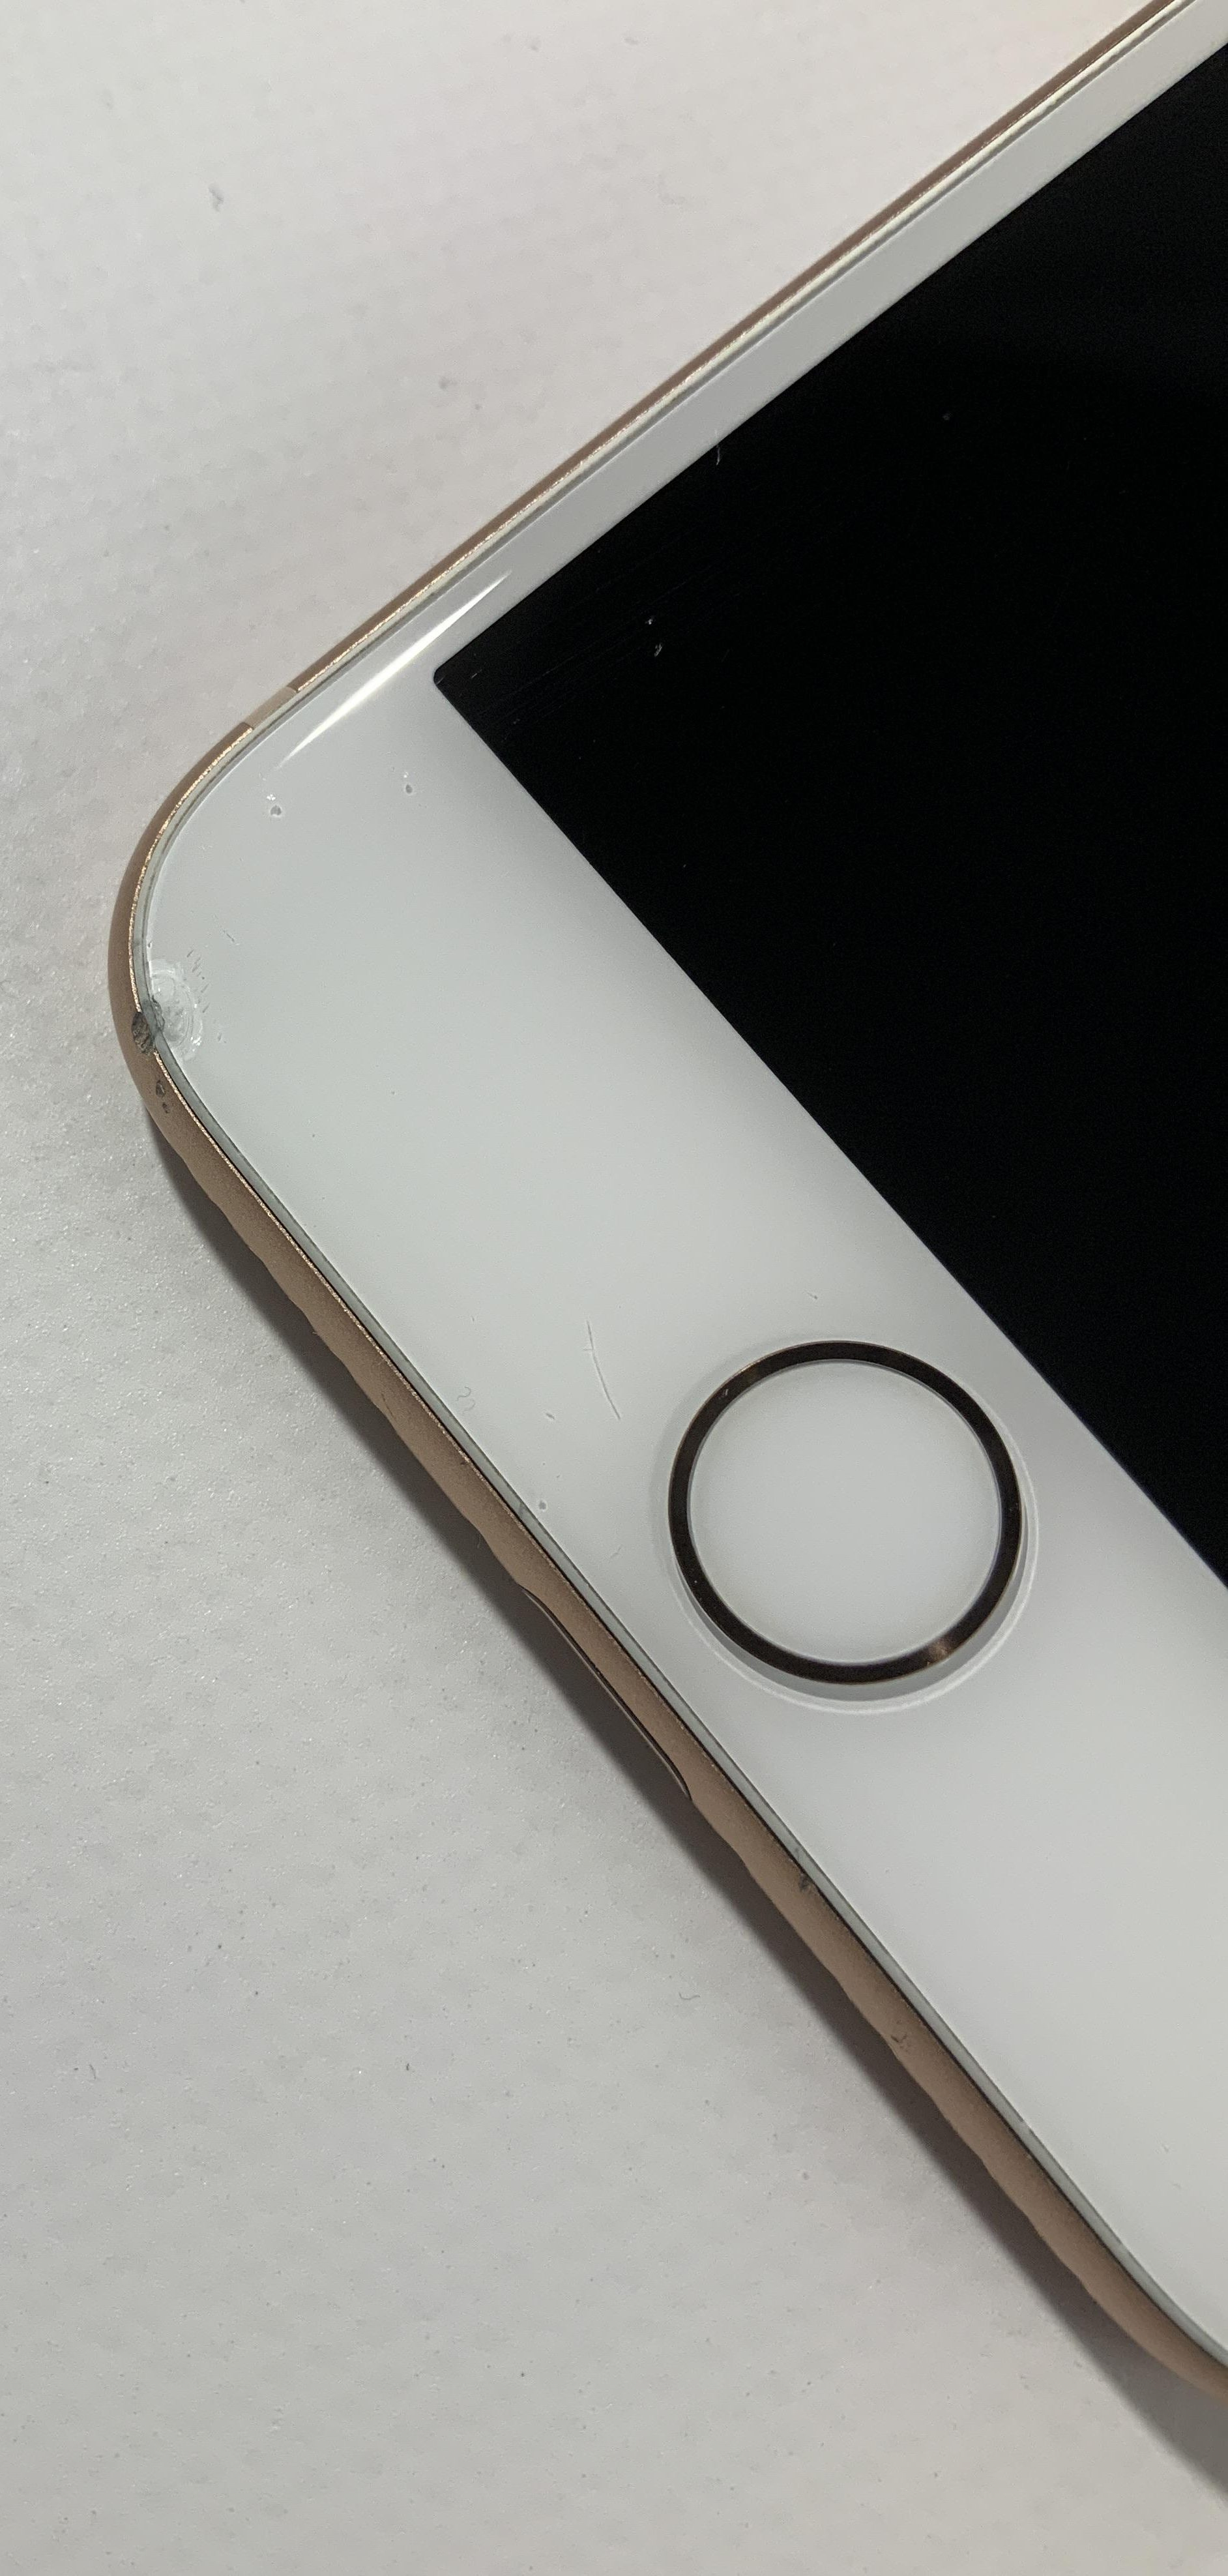 iPhone 8 256GB, 256GB, Gold, image 4